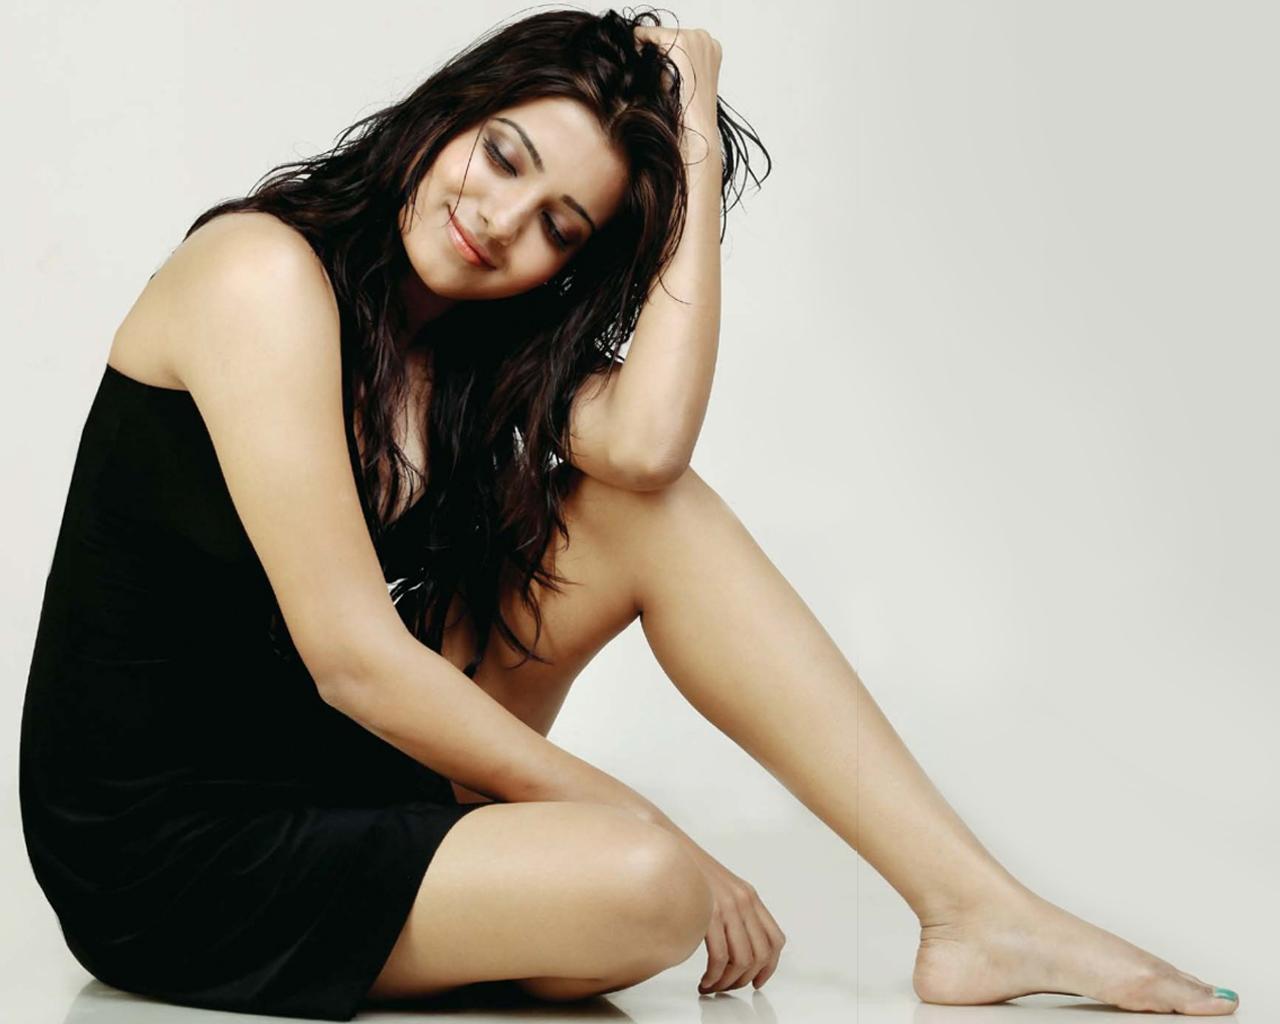 Best Hd Wallpapers Free Download Best Pics Store Samantha Actress Hd Wallpaper S